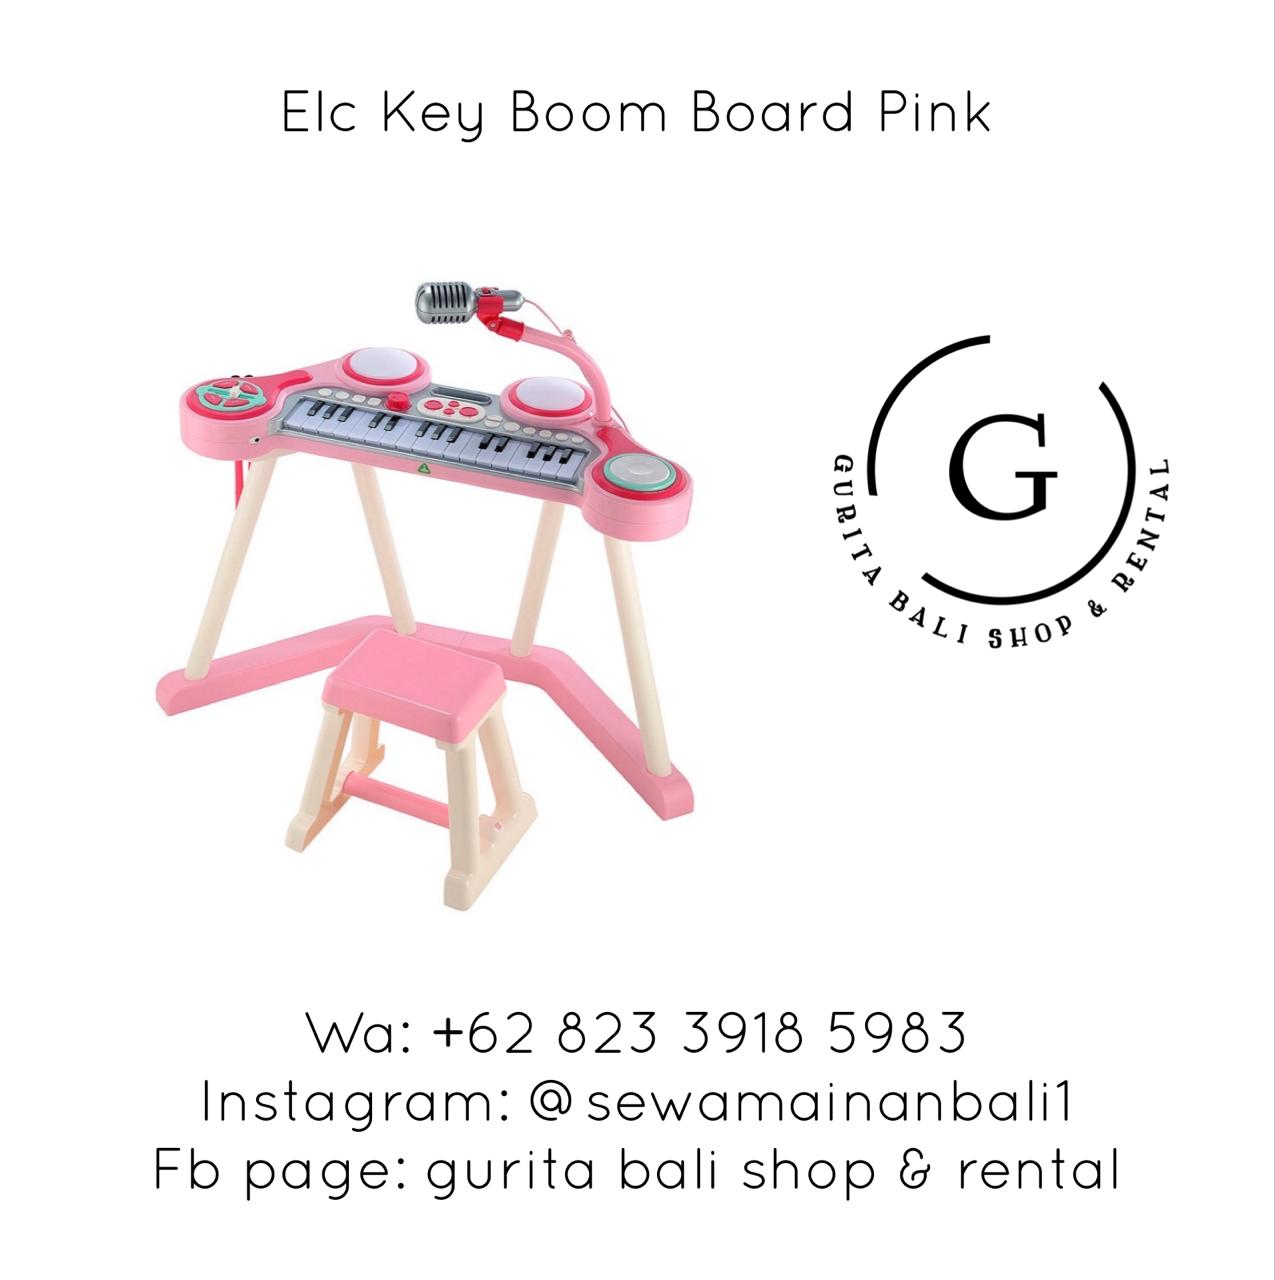 ELC KEY BOOM BOARD 2